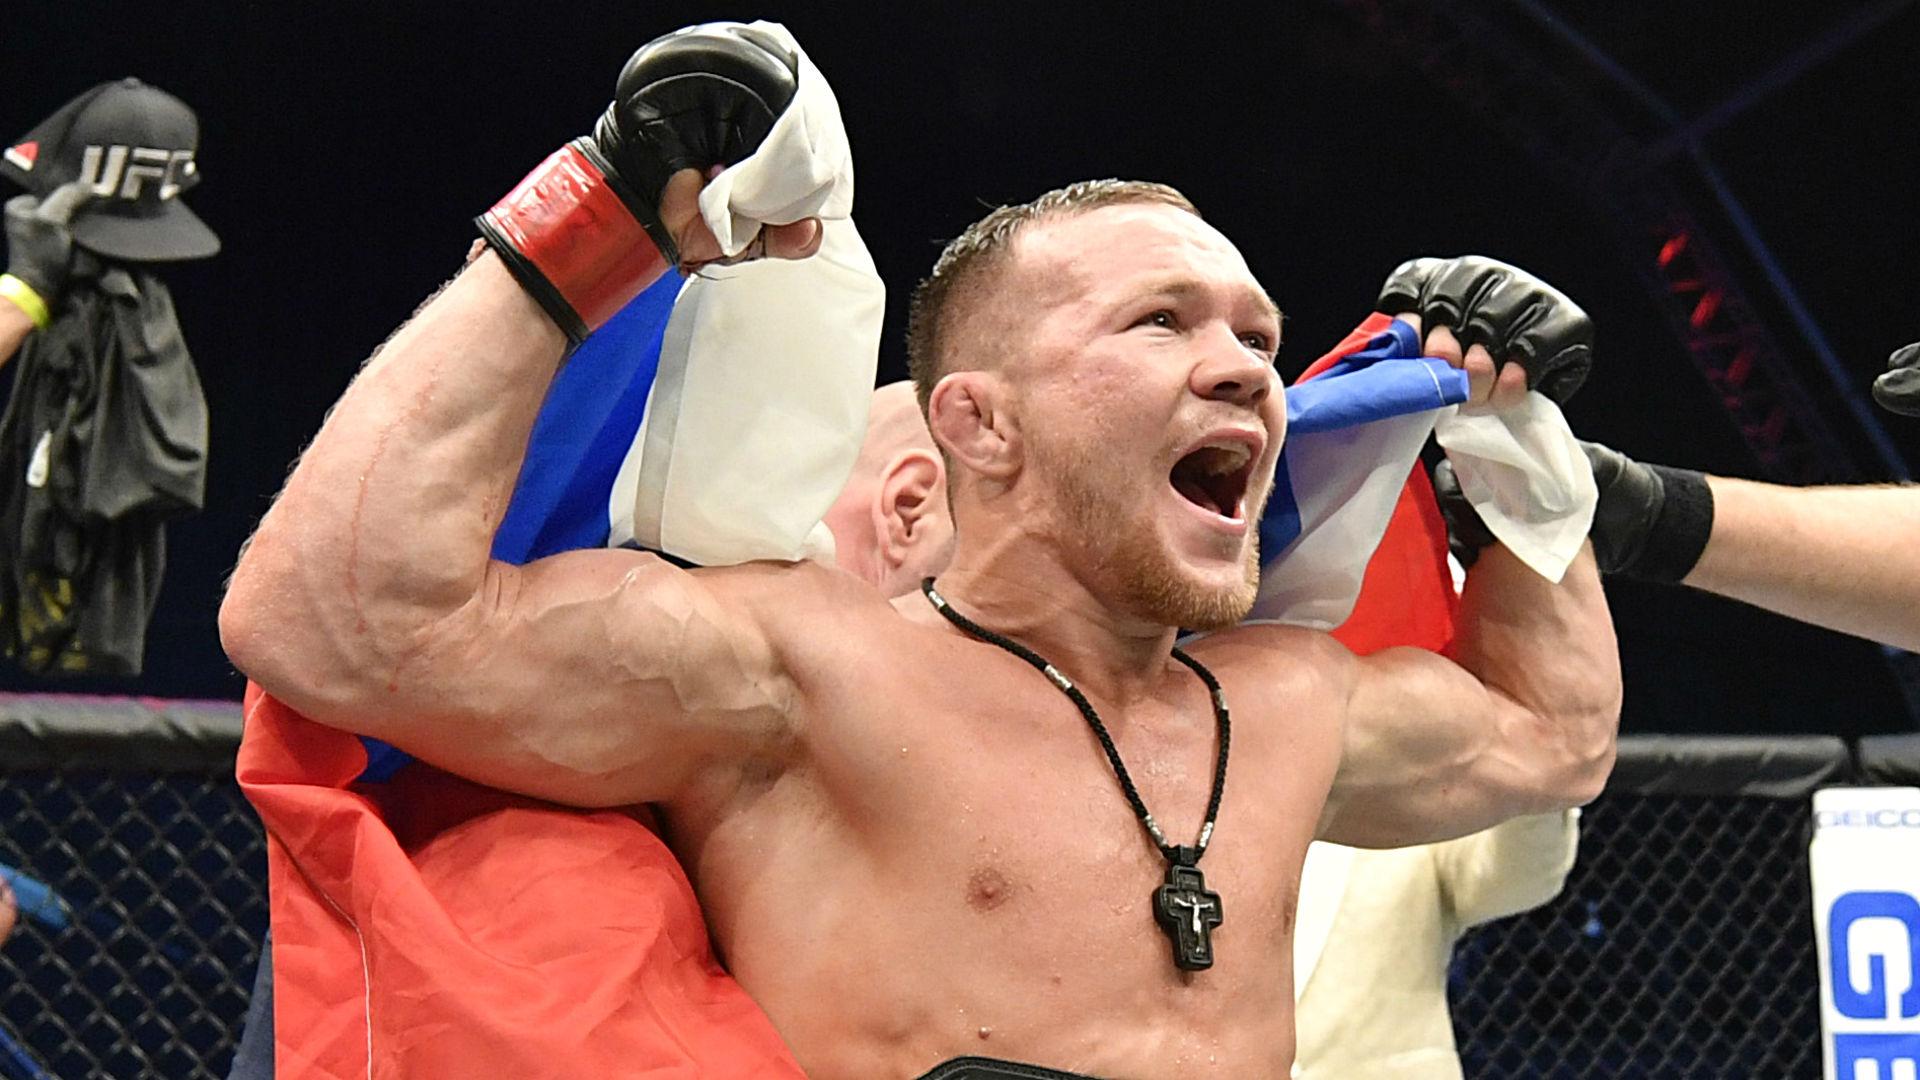 UFC 251: Petr Yan stops Jose Aldo with ground-and-pound barrage, grabs bantamweight belt